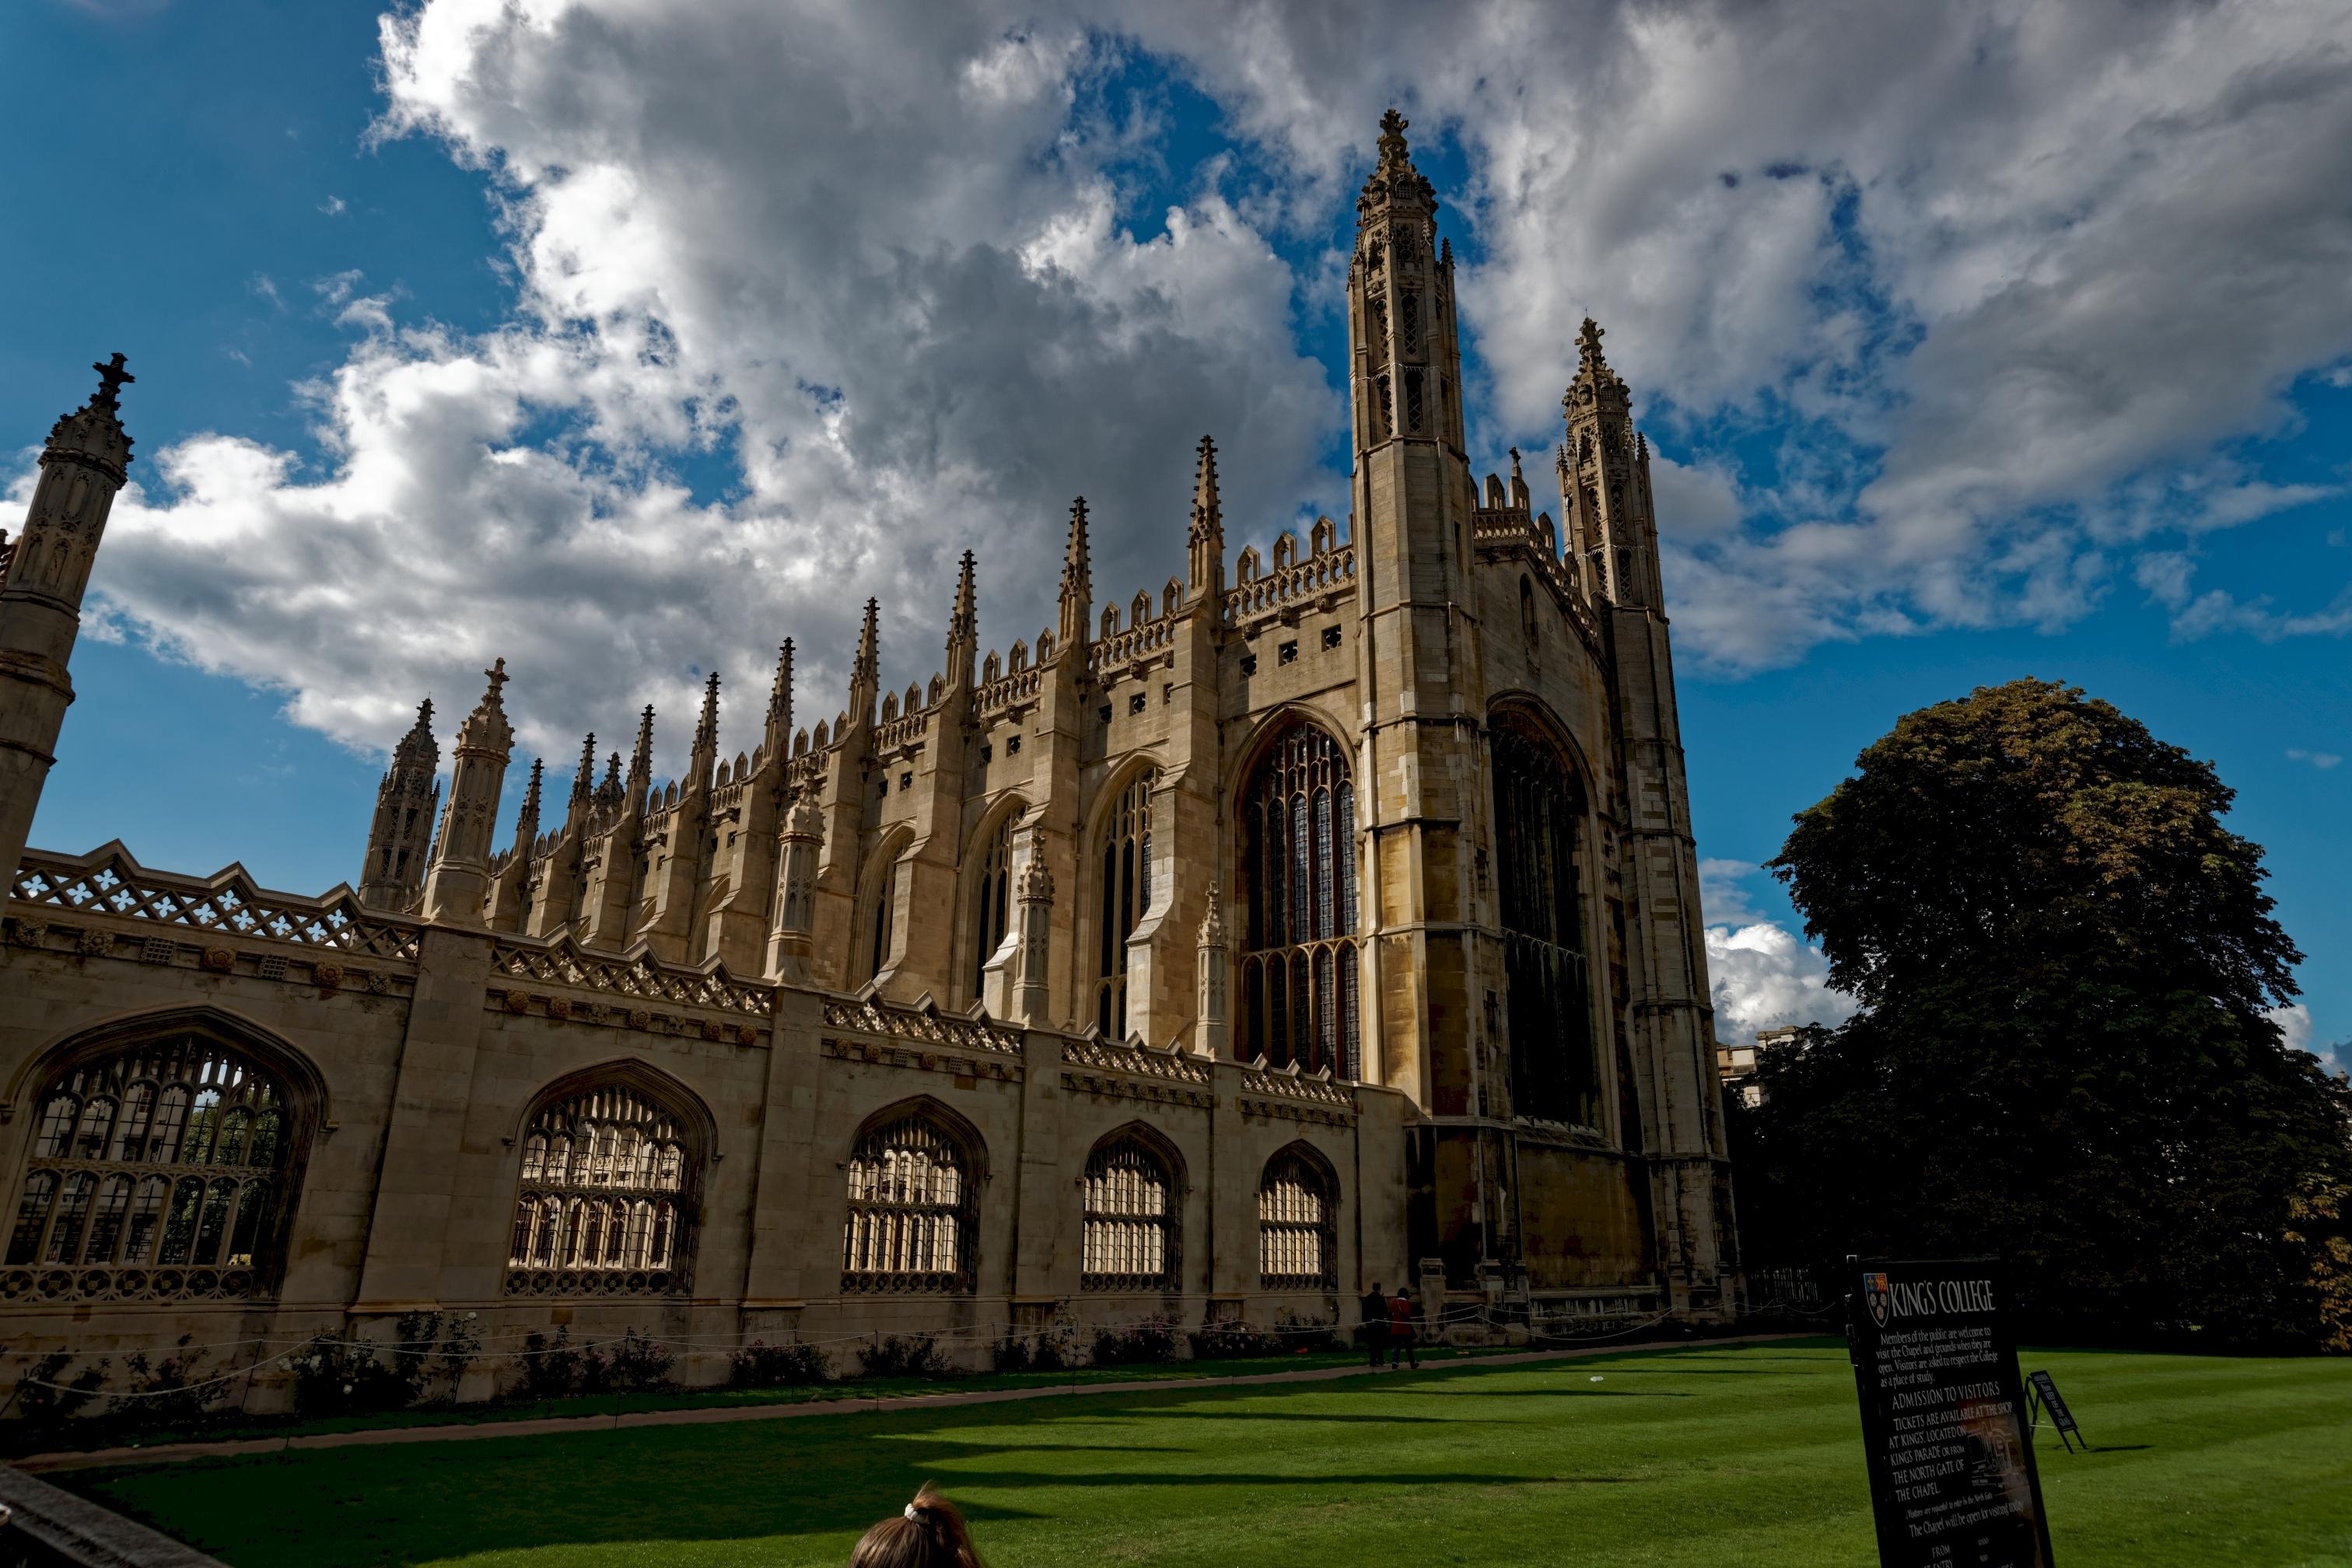 [King's College Chapel, Cambridge]